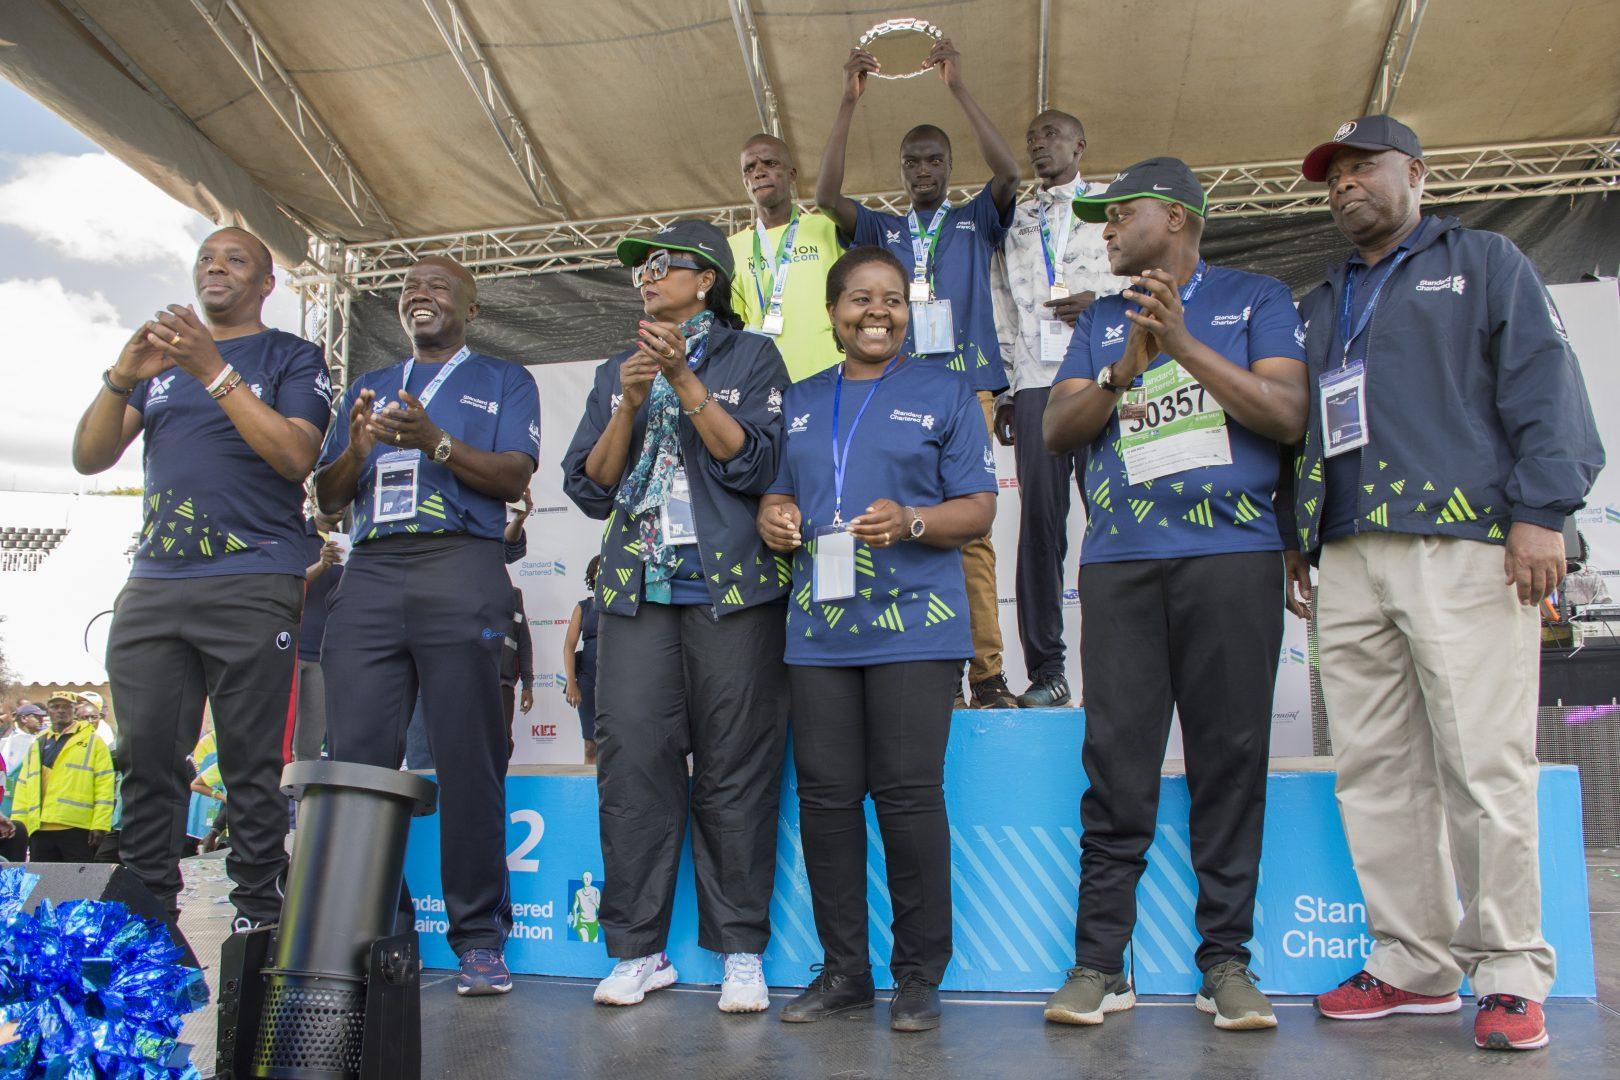 https://www.nairobimarathon.com/wp-content/uploads/2021/07/DSC_3297.jpg